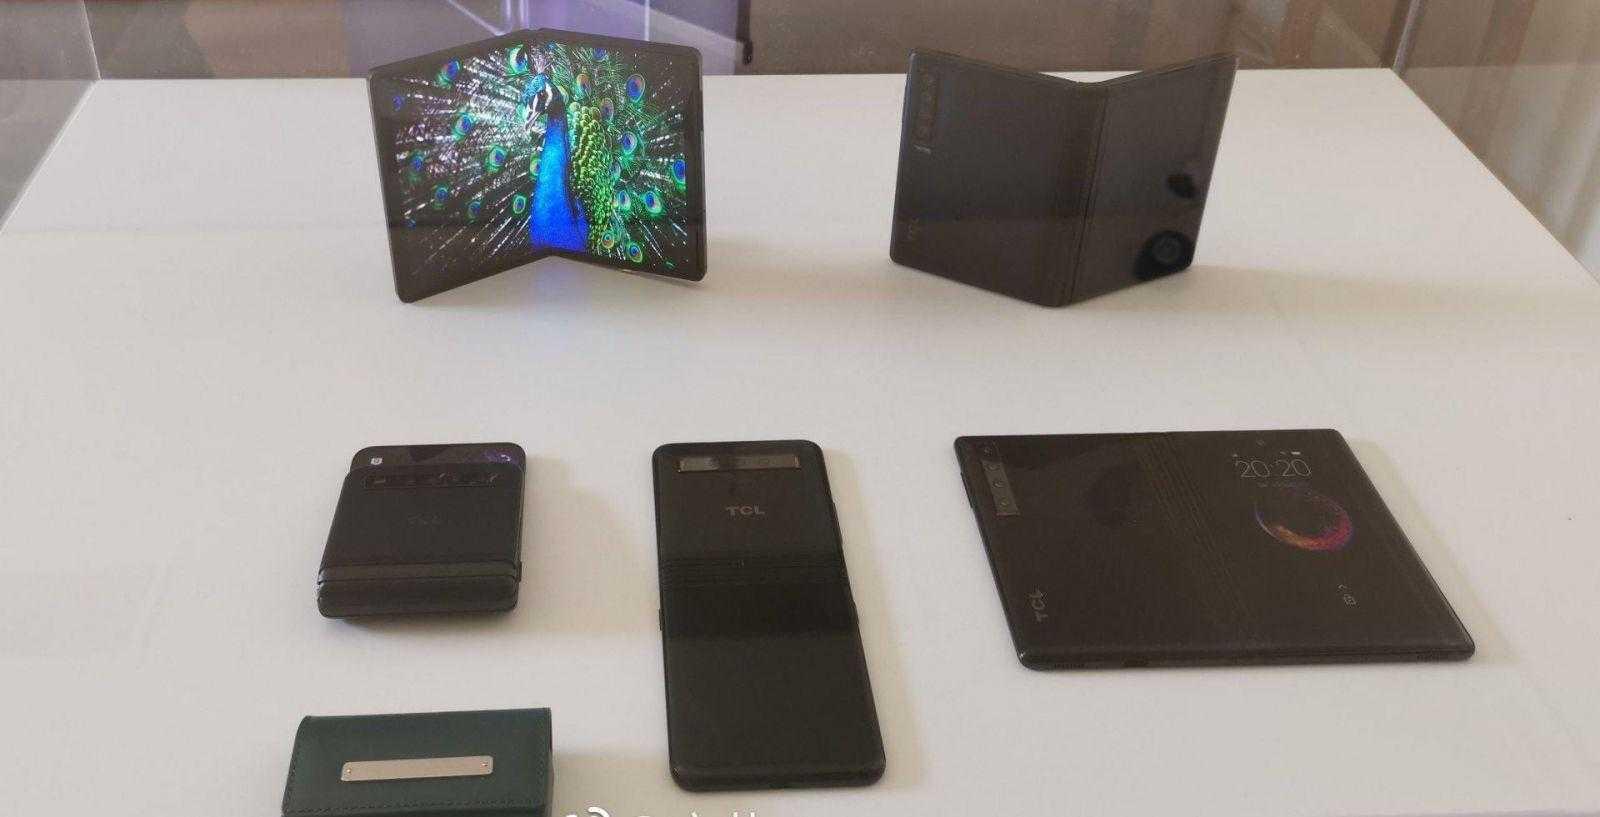 MWC 2019. TCL официально представила бюджетные сгибающиеся смартфоны (465d123dgy1g0gl1fis3ej22tc240e81 e1550941659197)